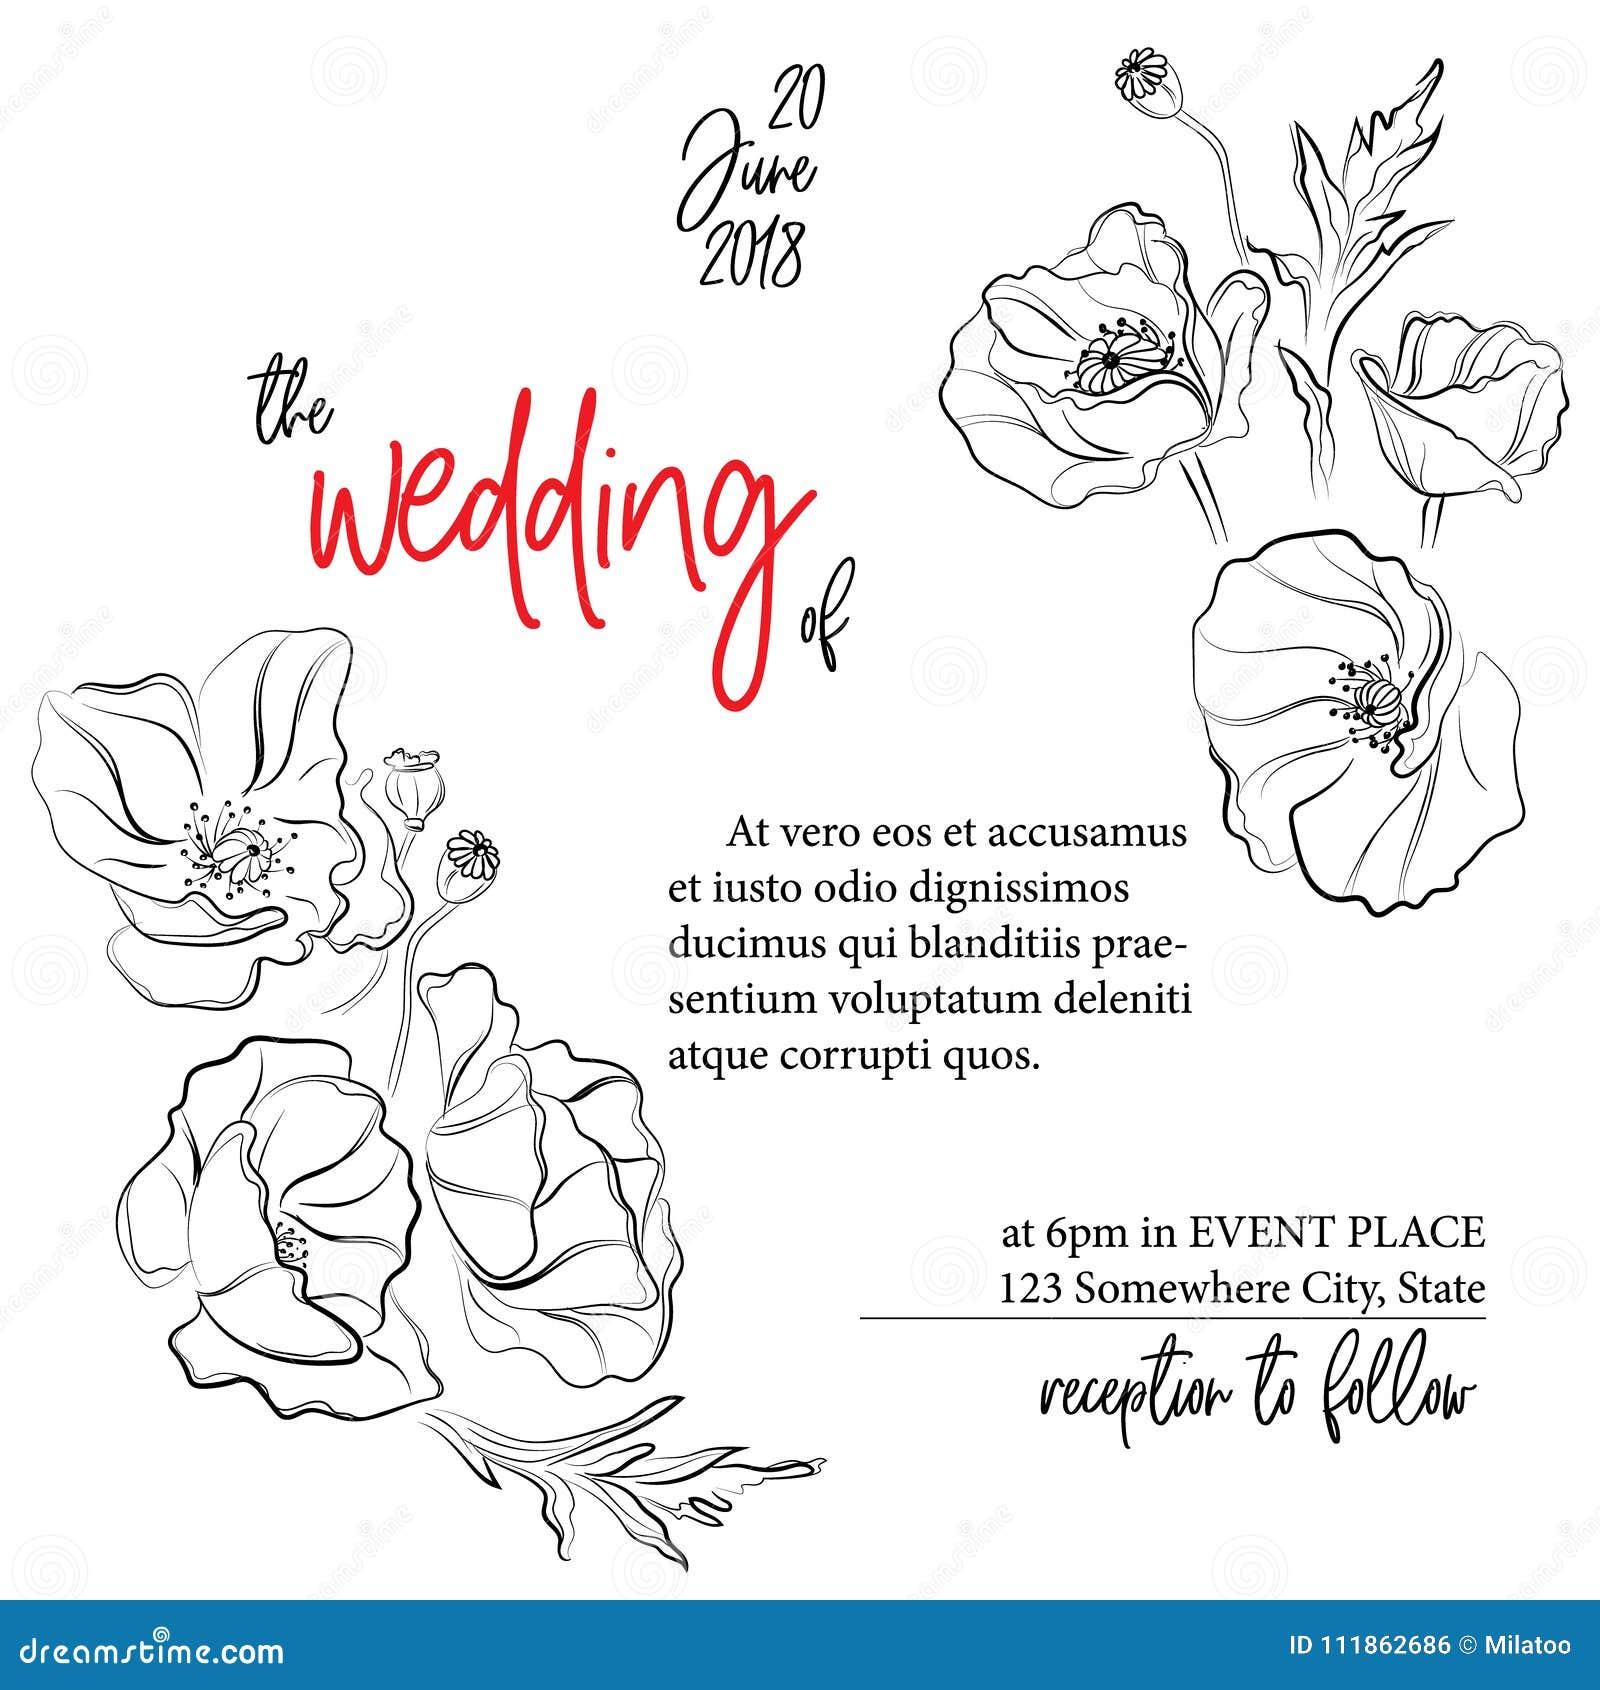 Wedding greeting card invitation modern holiday decoration with download wedding greeting card invitation modern holiday decoration with poppies flowers floral vintage template m4hsunfo